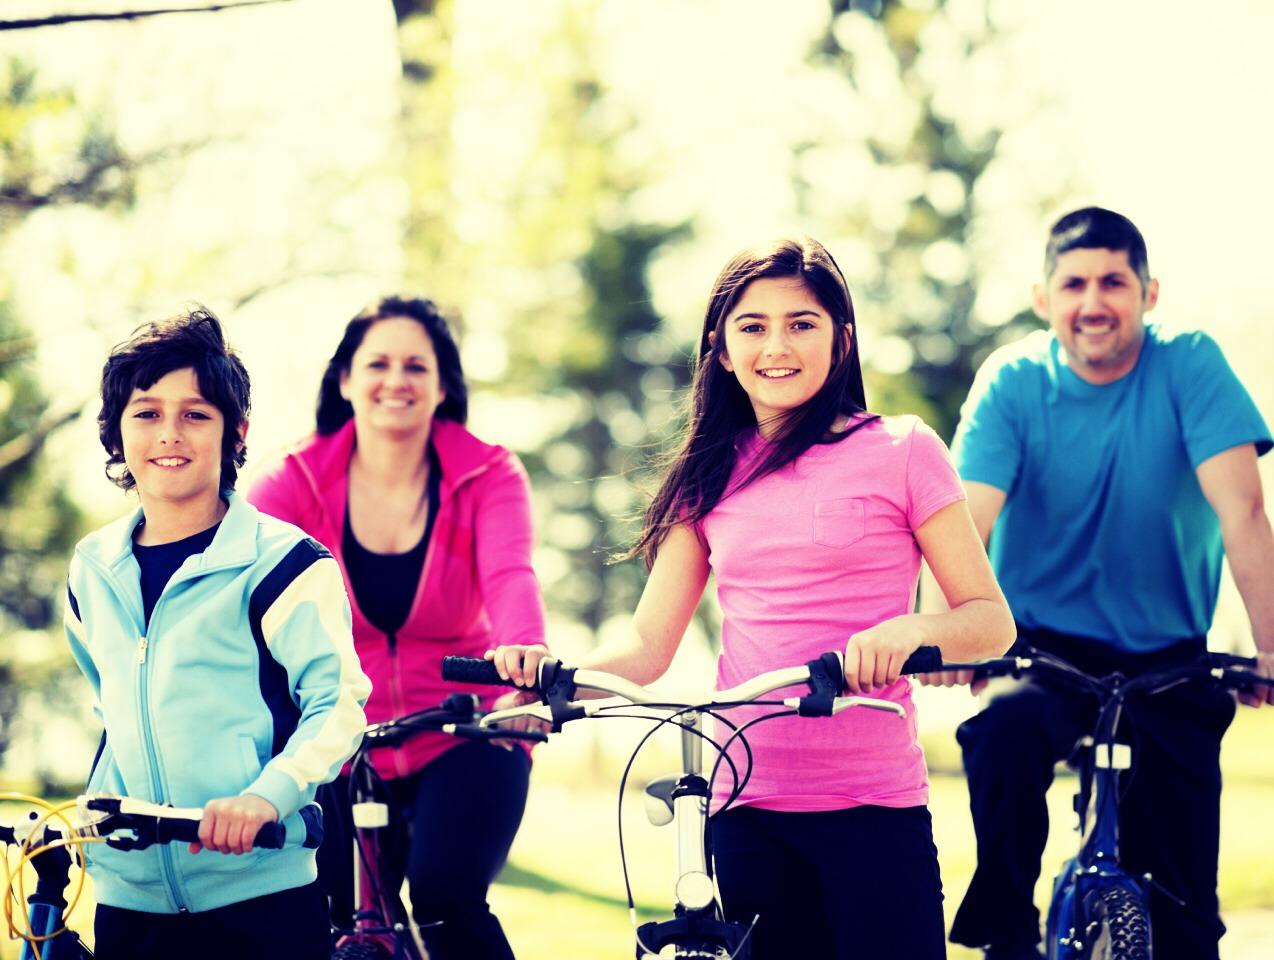 Go biking together